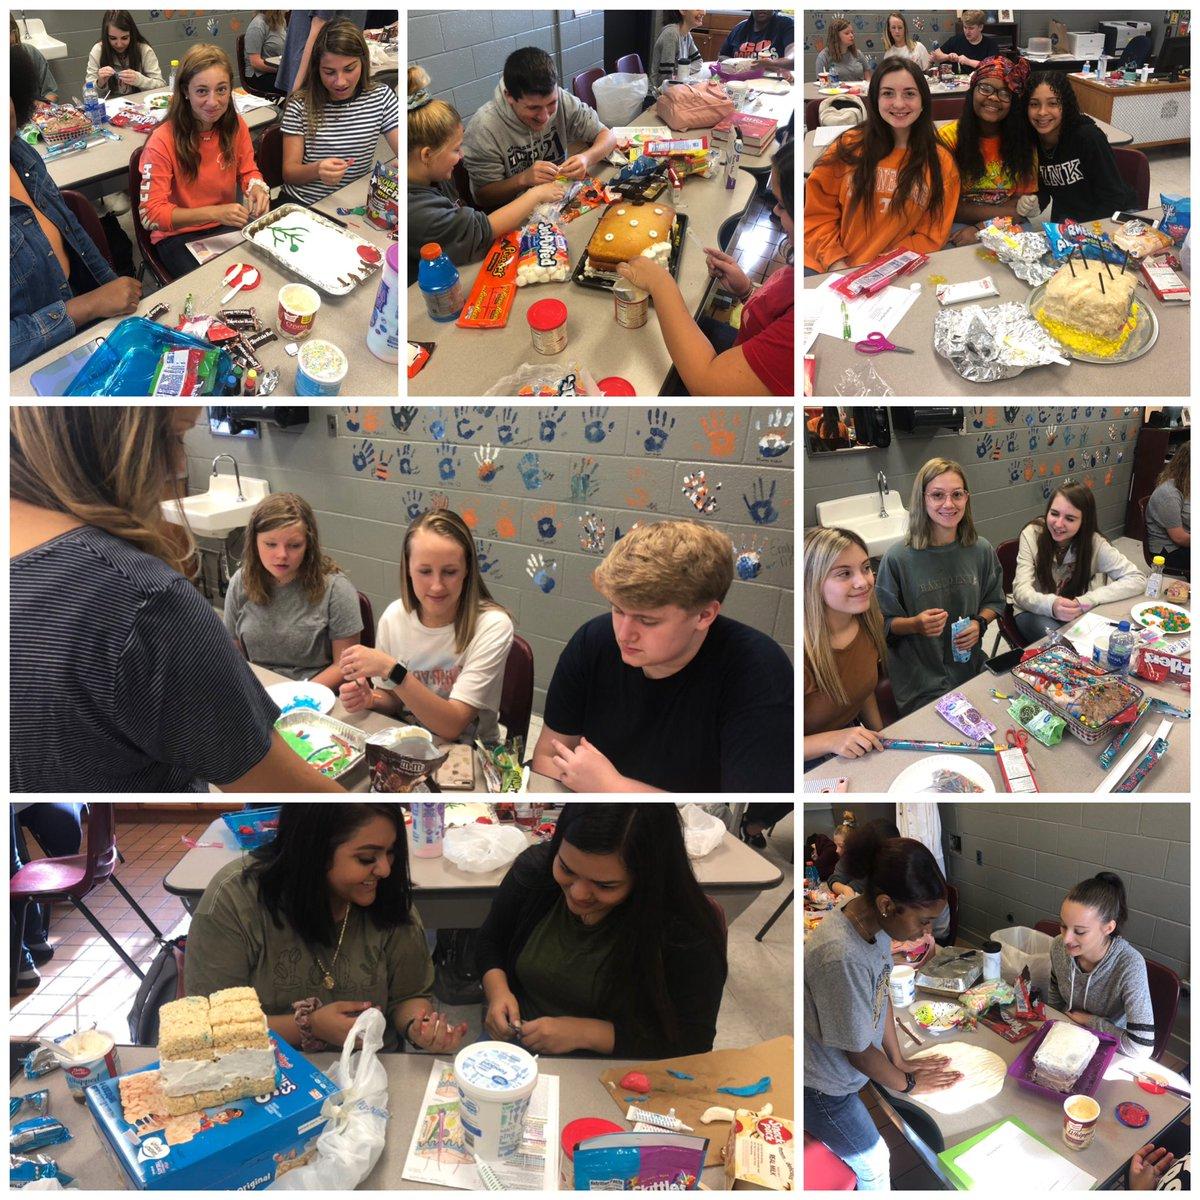 @DCcougarnation Mrs. Alt's A&P class working on skin anatomy cakes  #seizetheday <br>http://pic.twitter.com/vT7hMOht5z